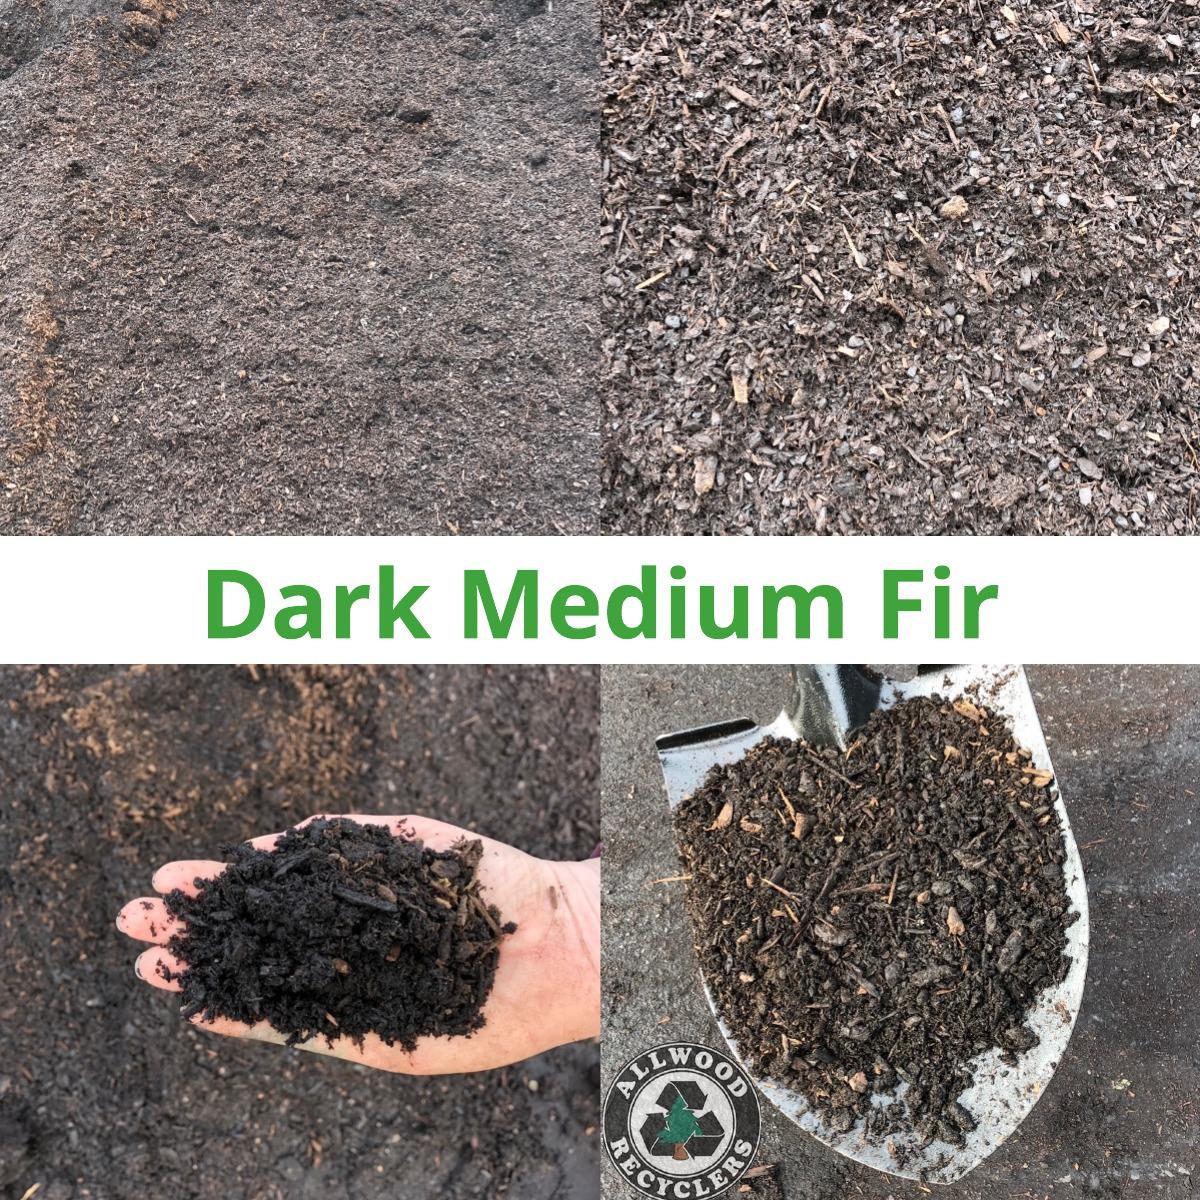 Dark Medium Fir